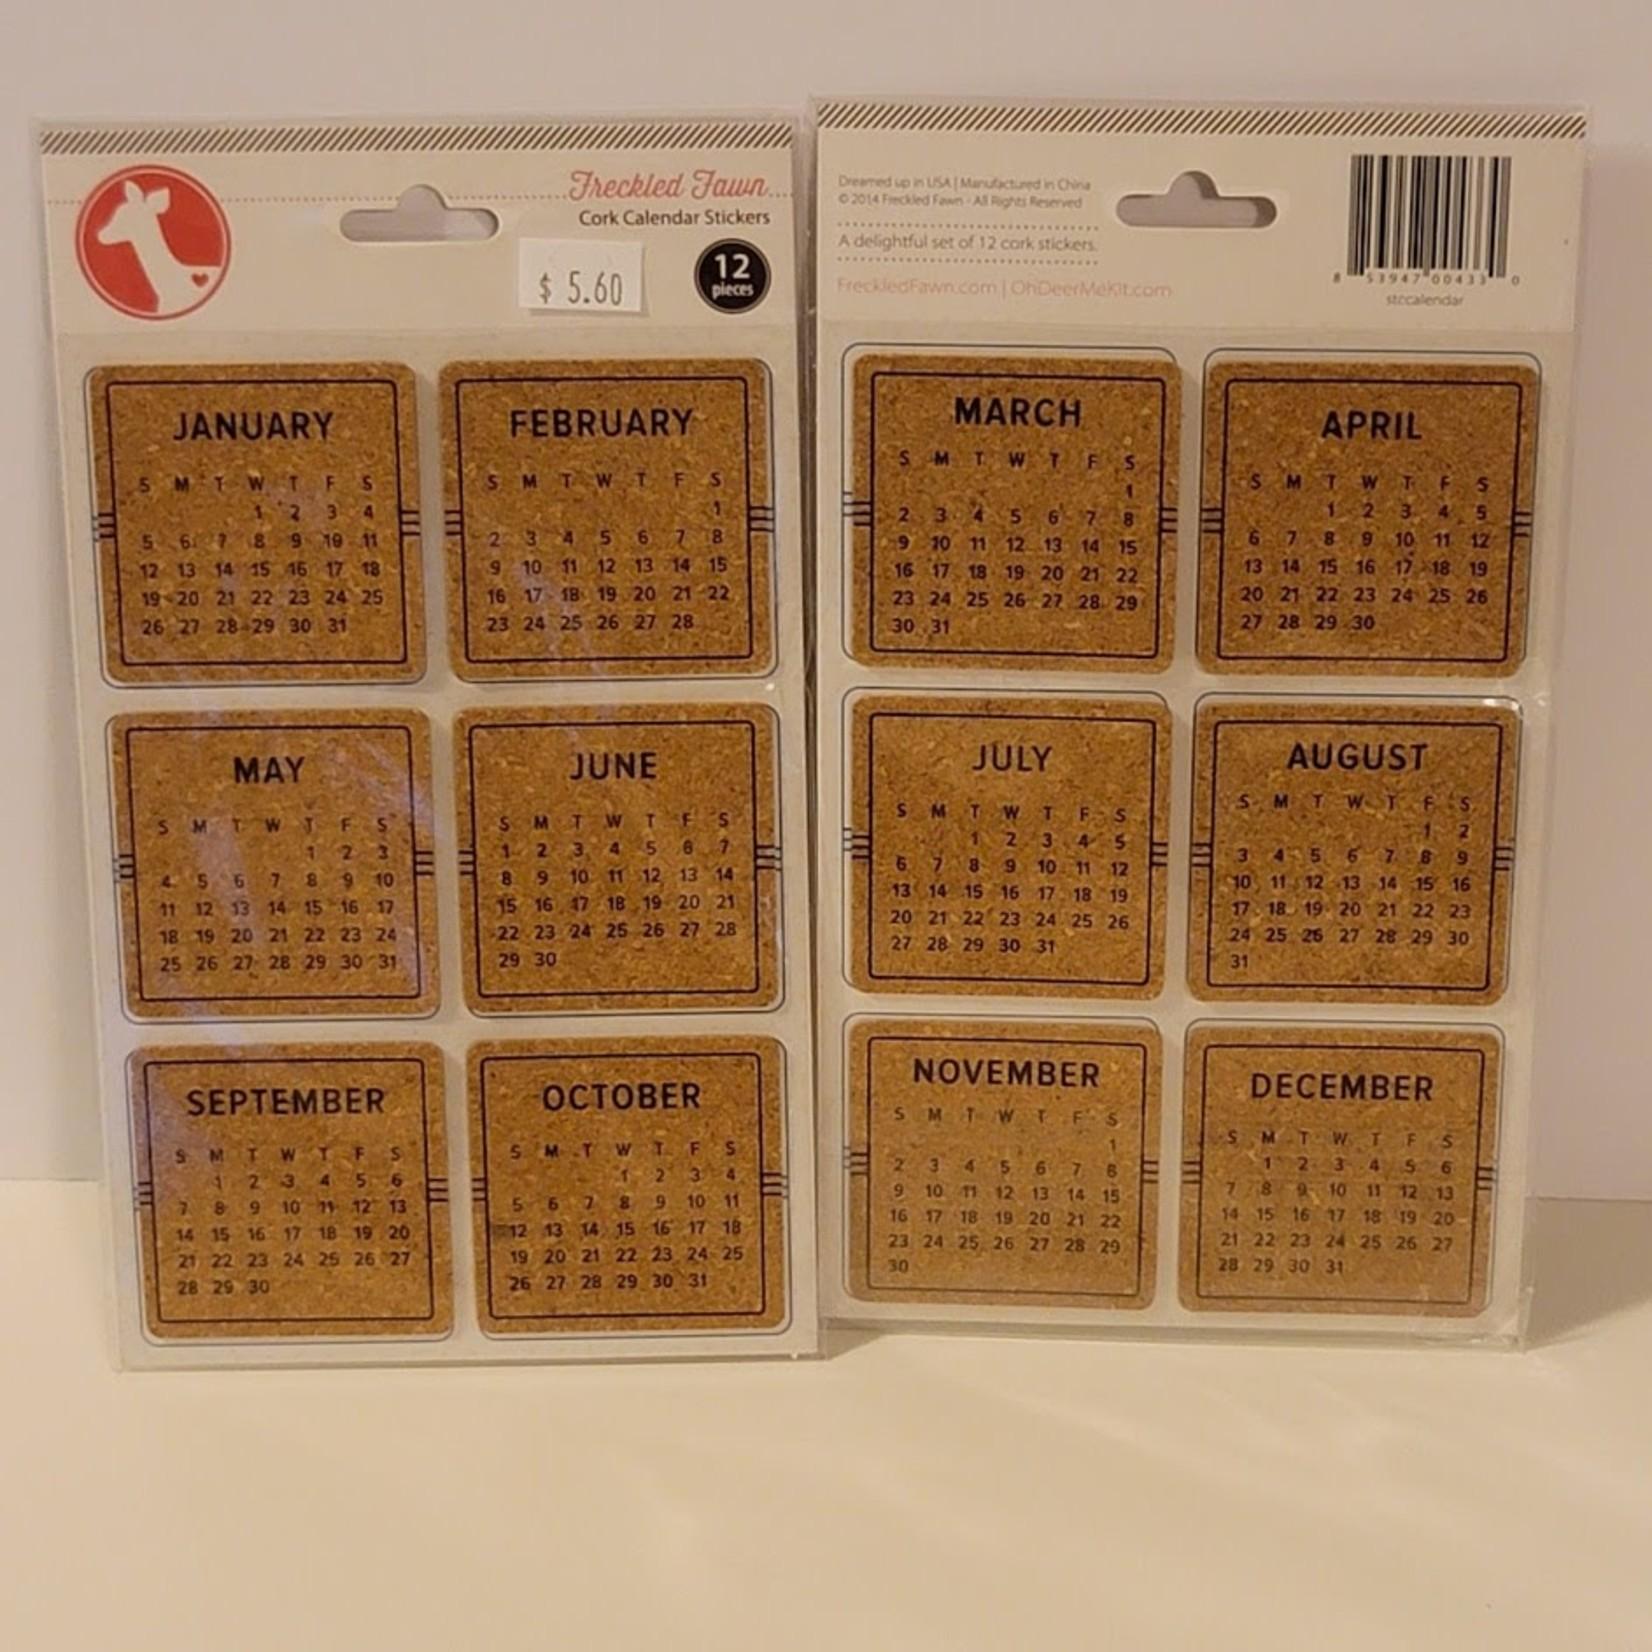 Freckled Fawn - Cork Calendar Stickers